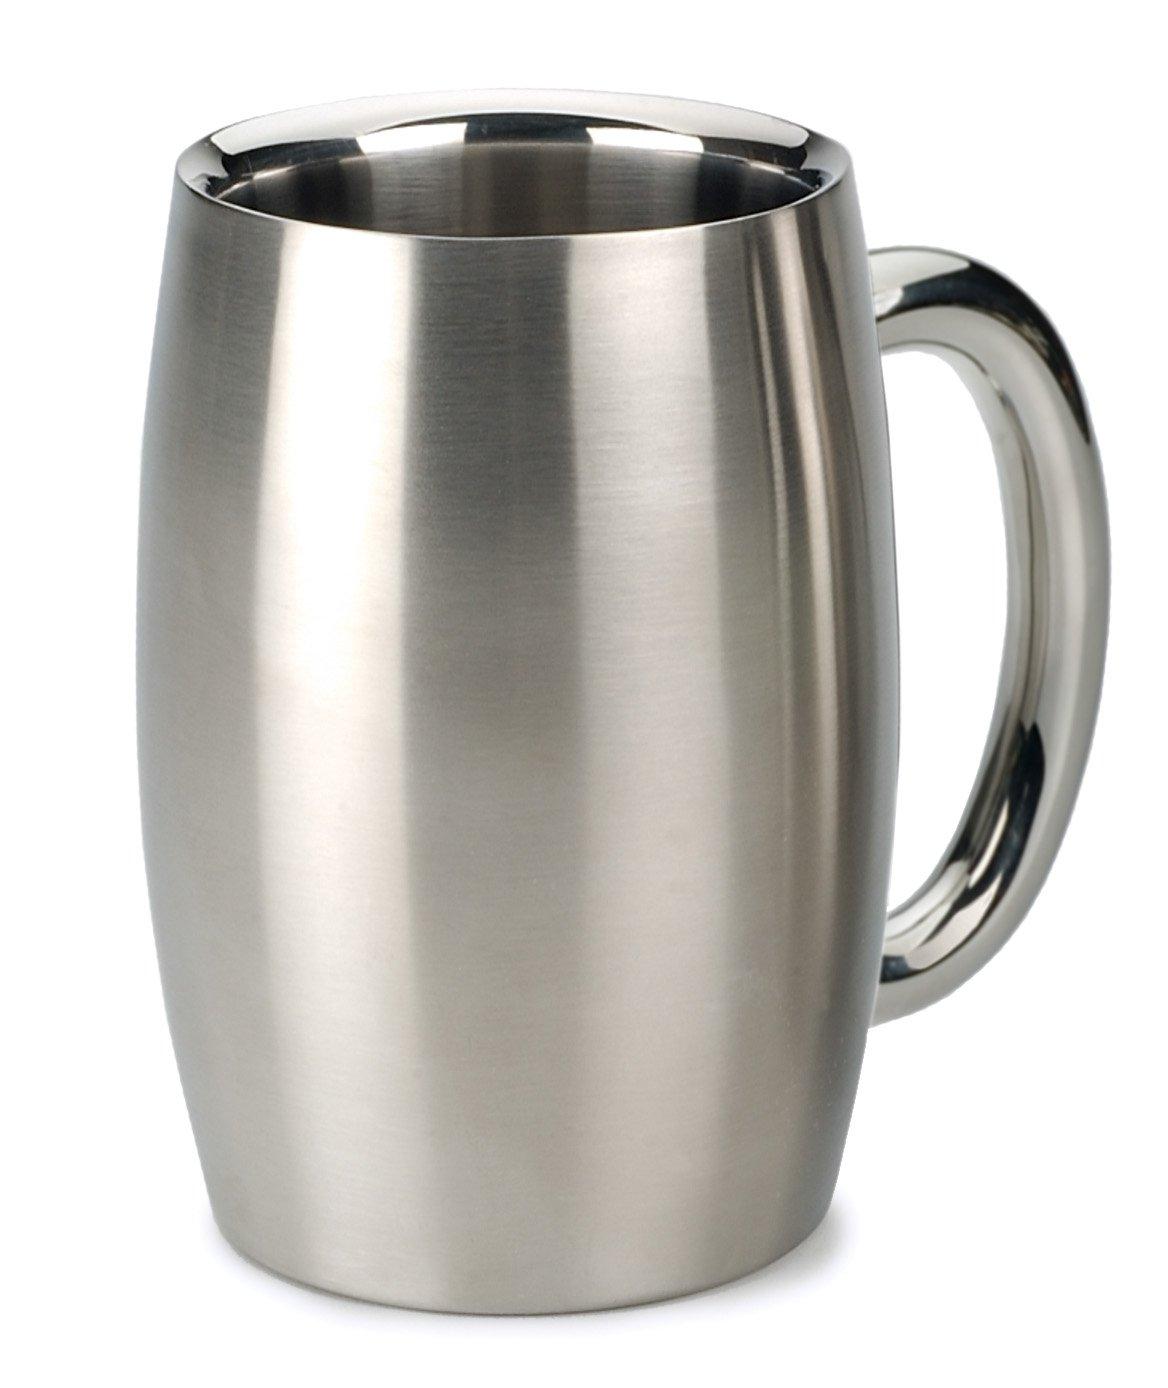 RSVP International Endurance Stainless Steel Double Walled Beer Mug, 15 Ounce